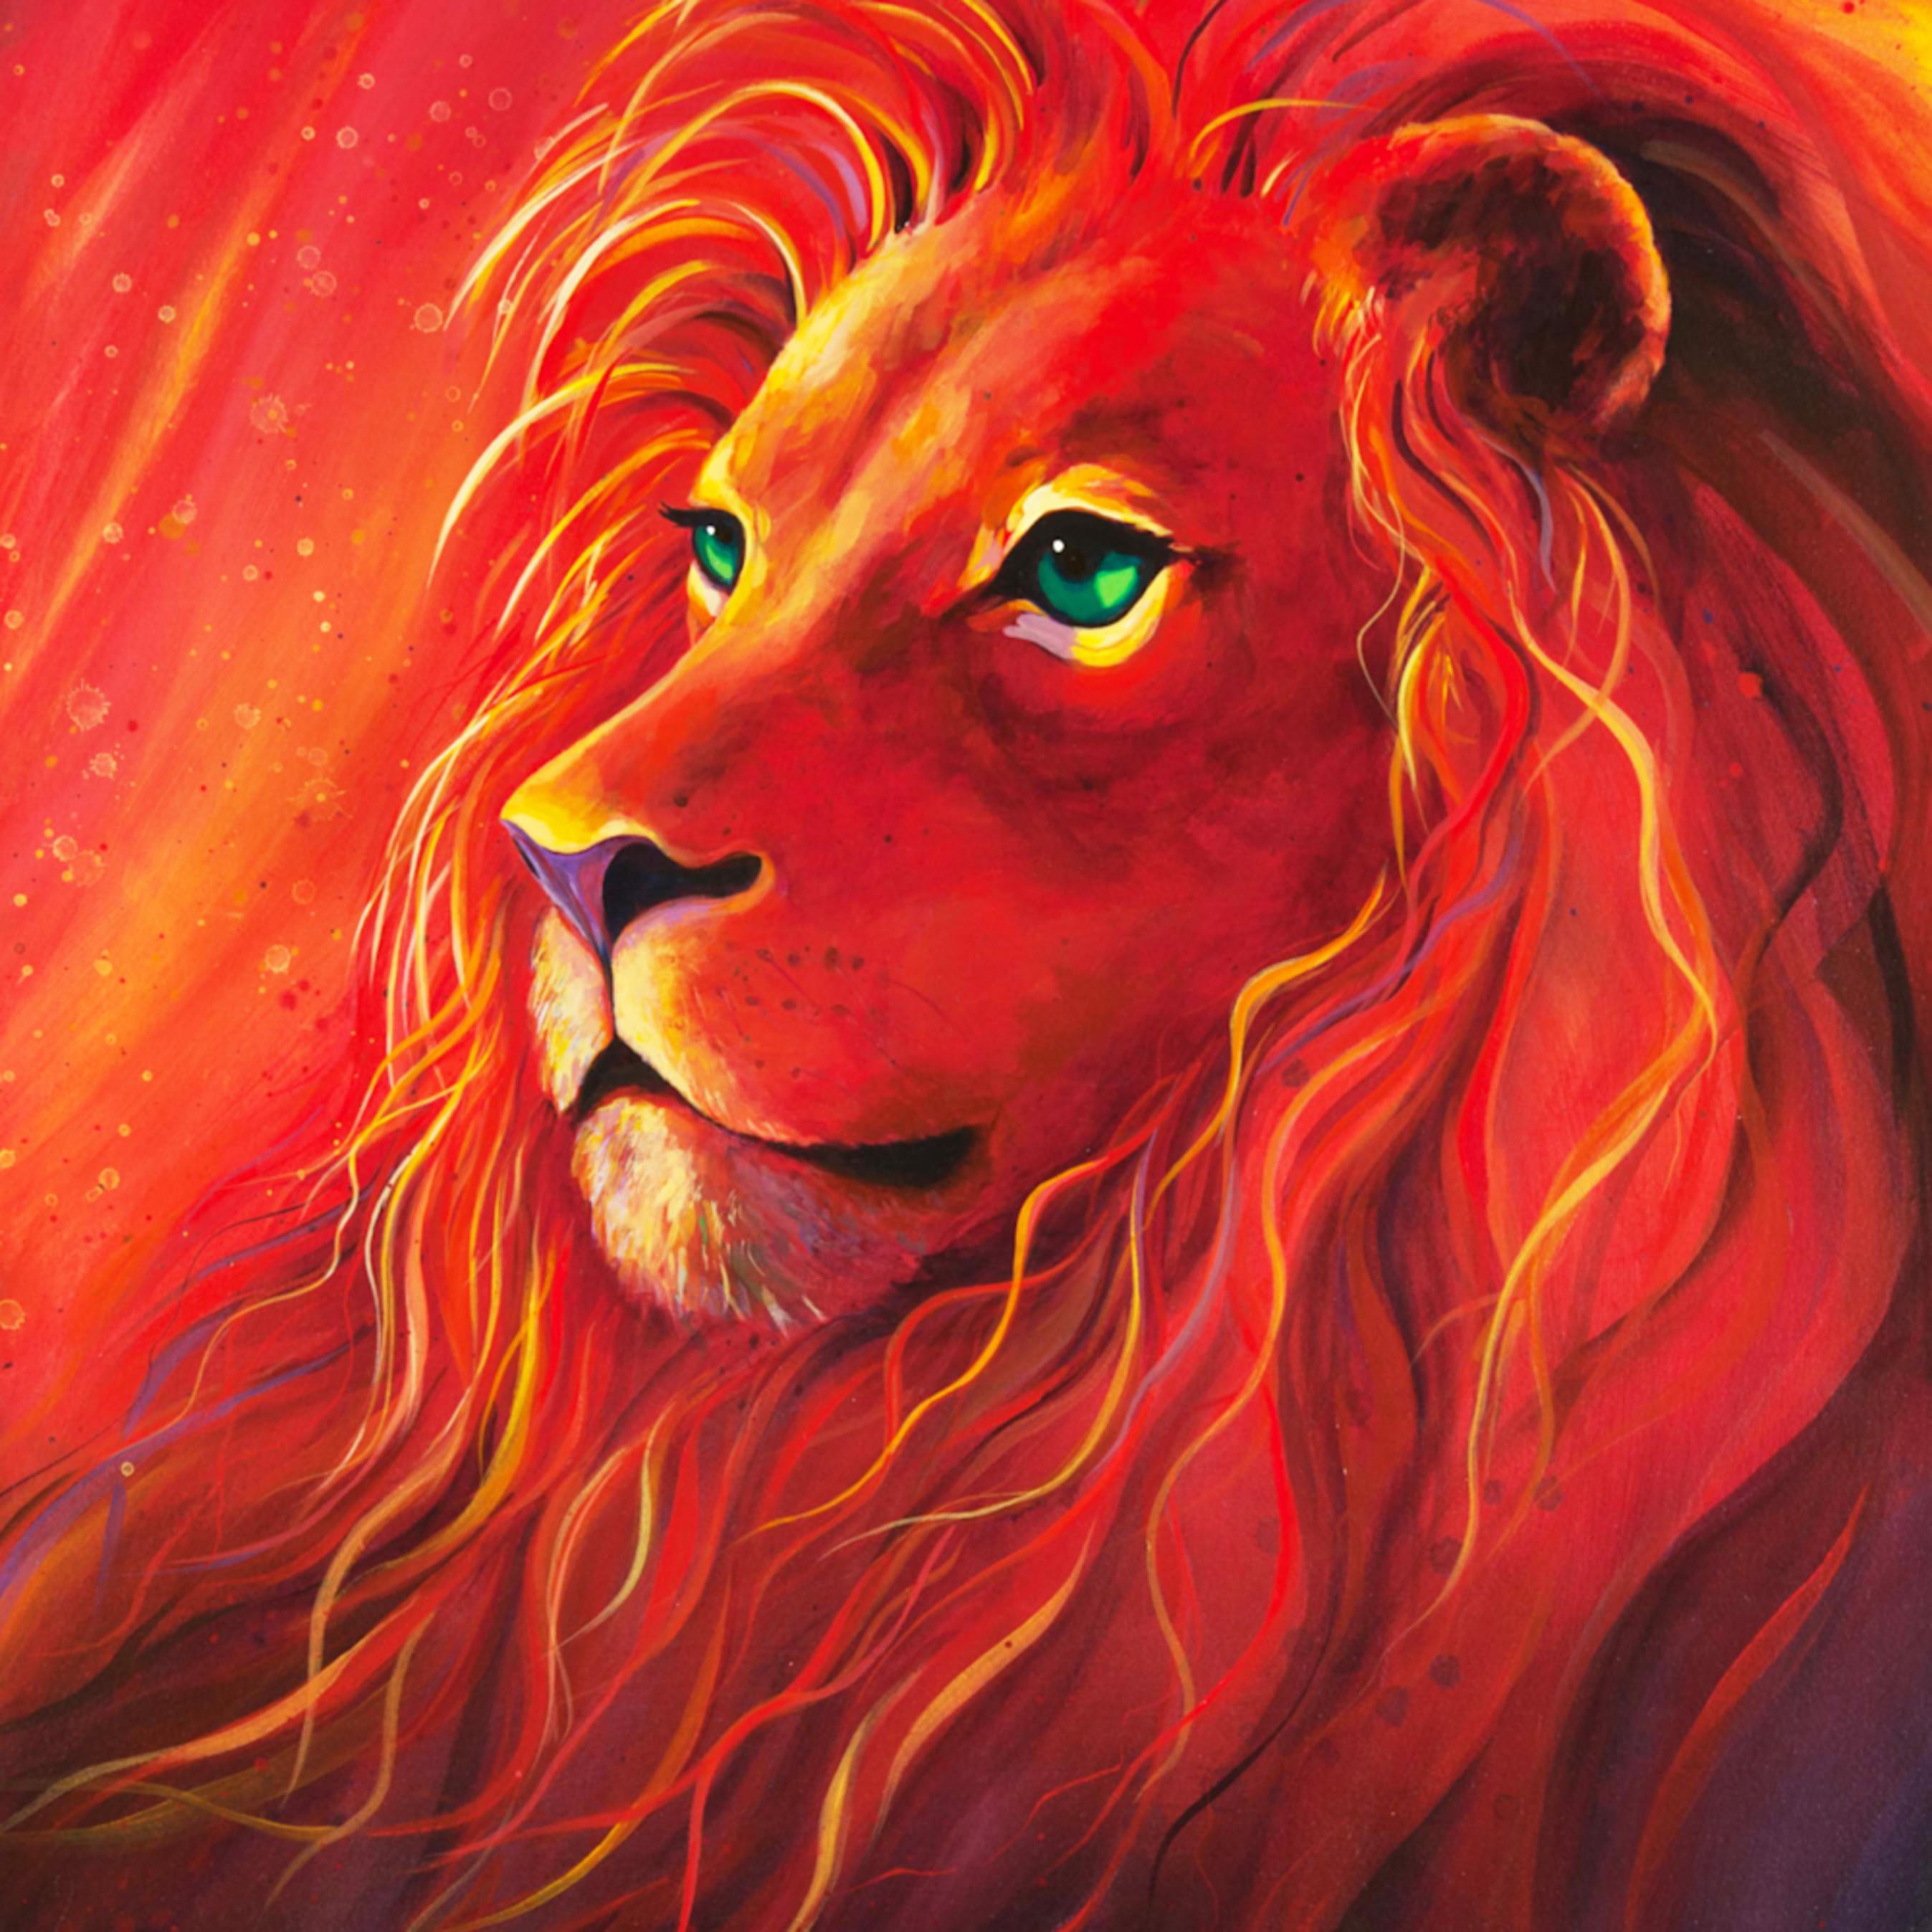 Samuel s lion yf9xdy